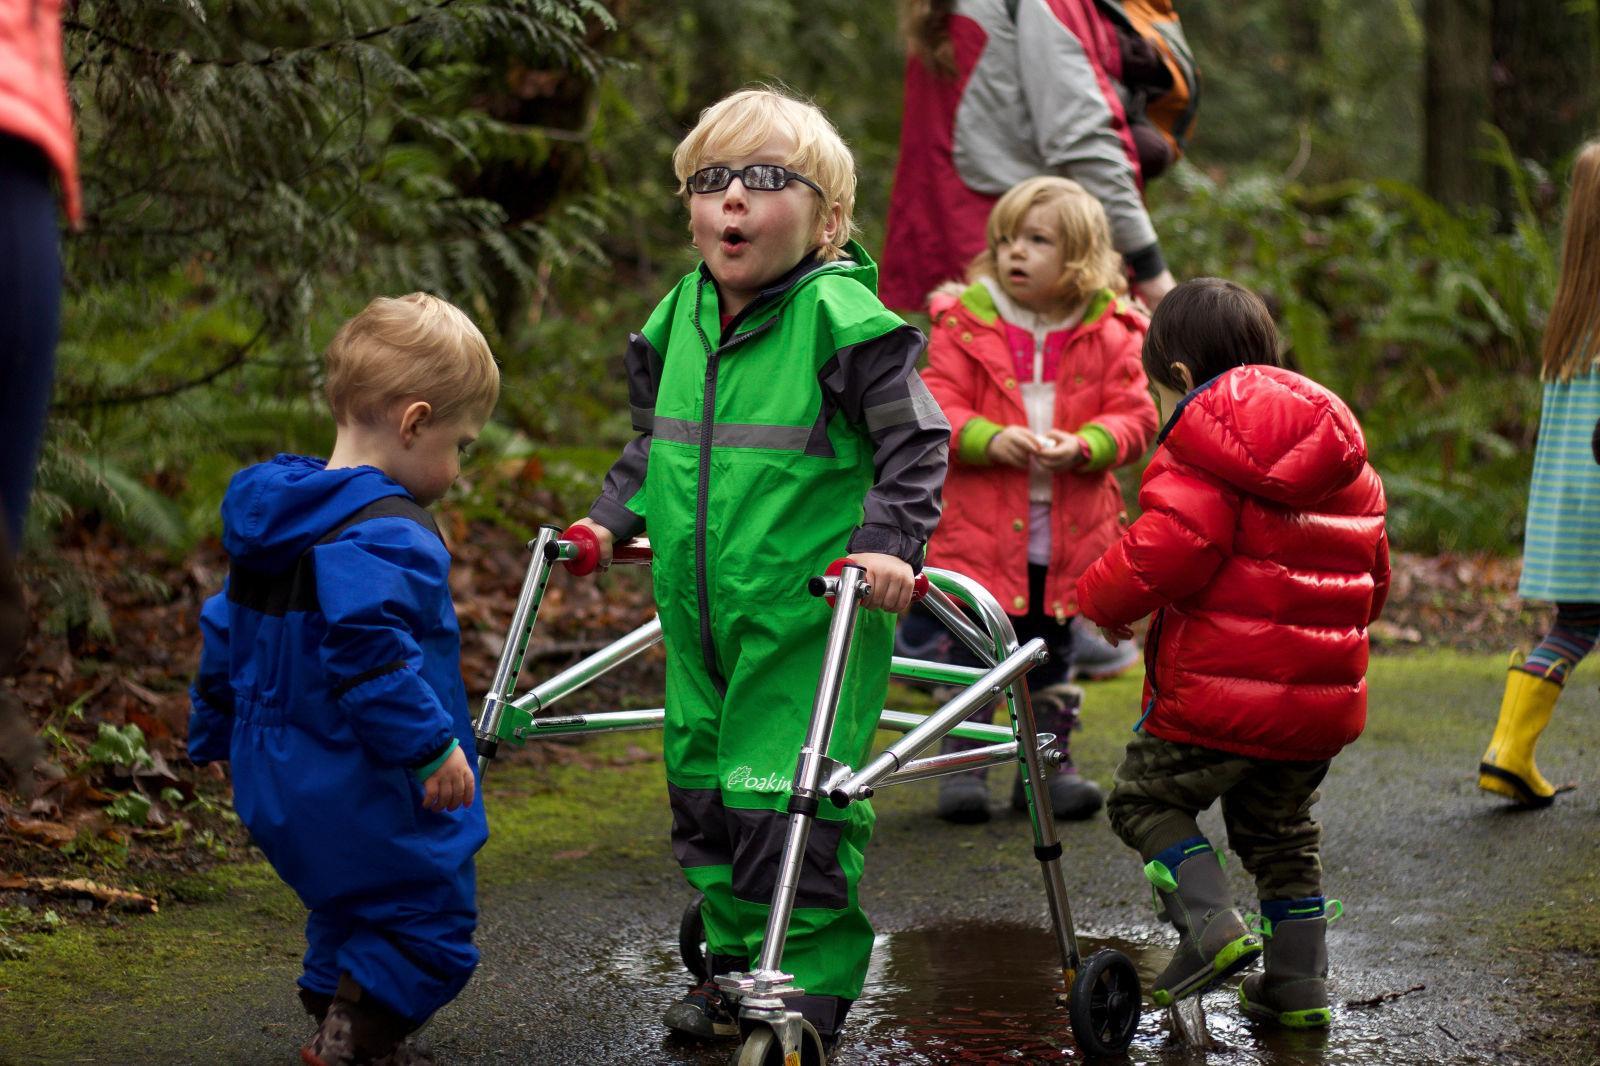 (100-120cm Height) Directional Four Wheel Walker Learner Venicle Brain Cerebral Palsy Kids Children Child Rehabilitation Training Equipment Stand Frame Directional Four - Wheeled Walker